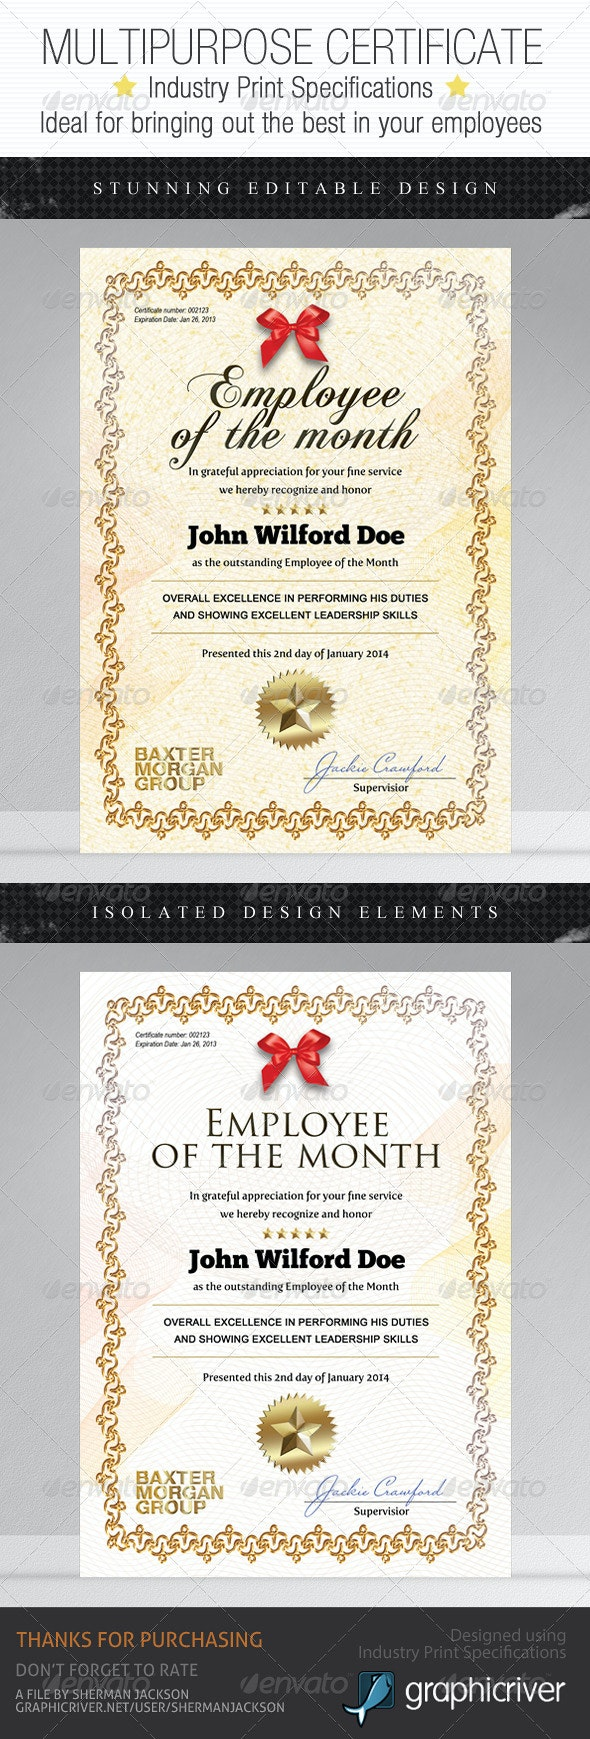 Multipurpose Certificates - Employee Edition - Certificates Stationery